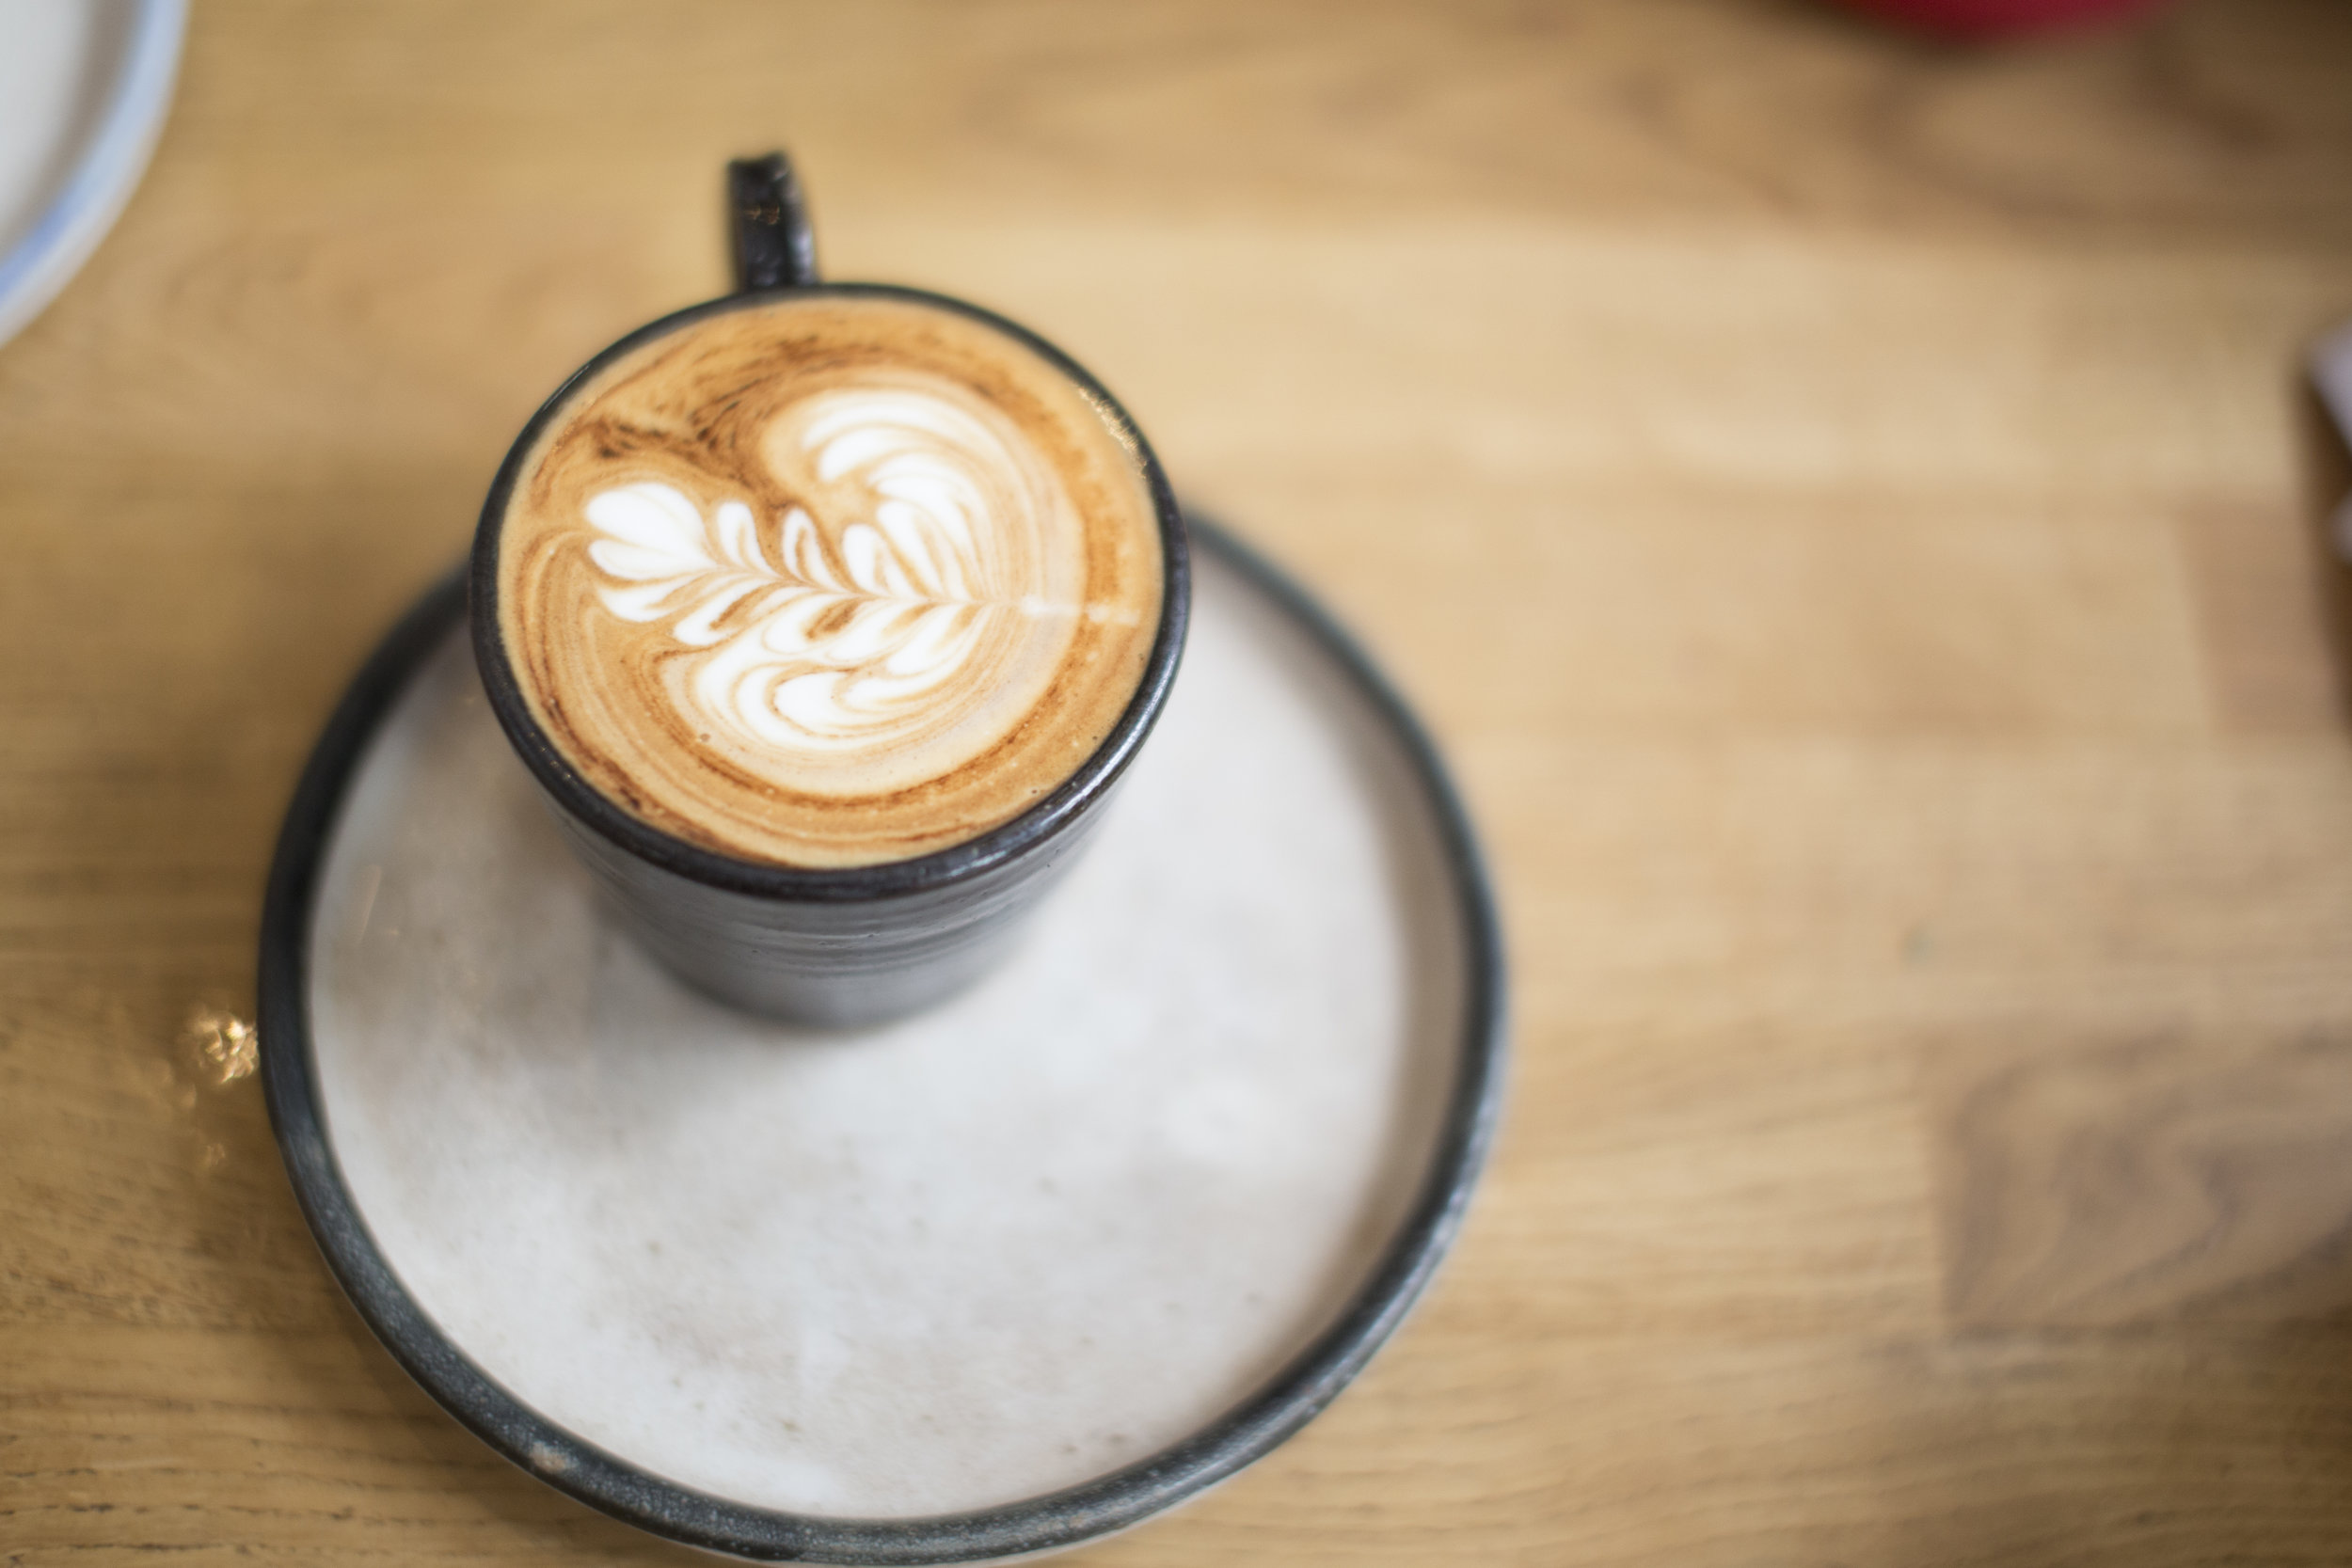 UKCW - 2017 - Farm Girl Cafe 2 - Coffee - Farm Girl Cafe.jpg